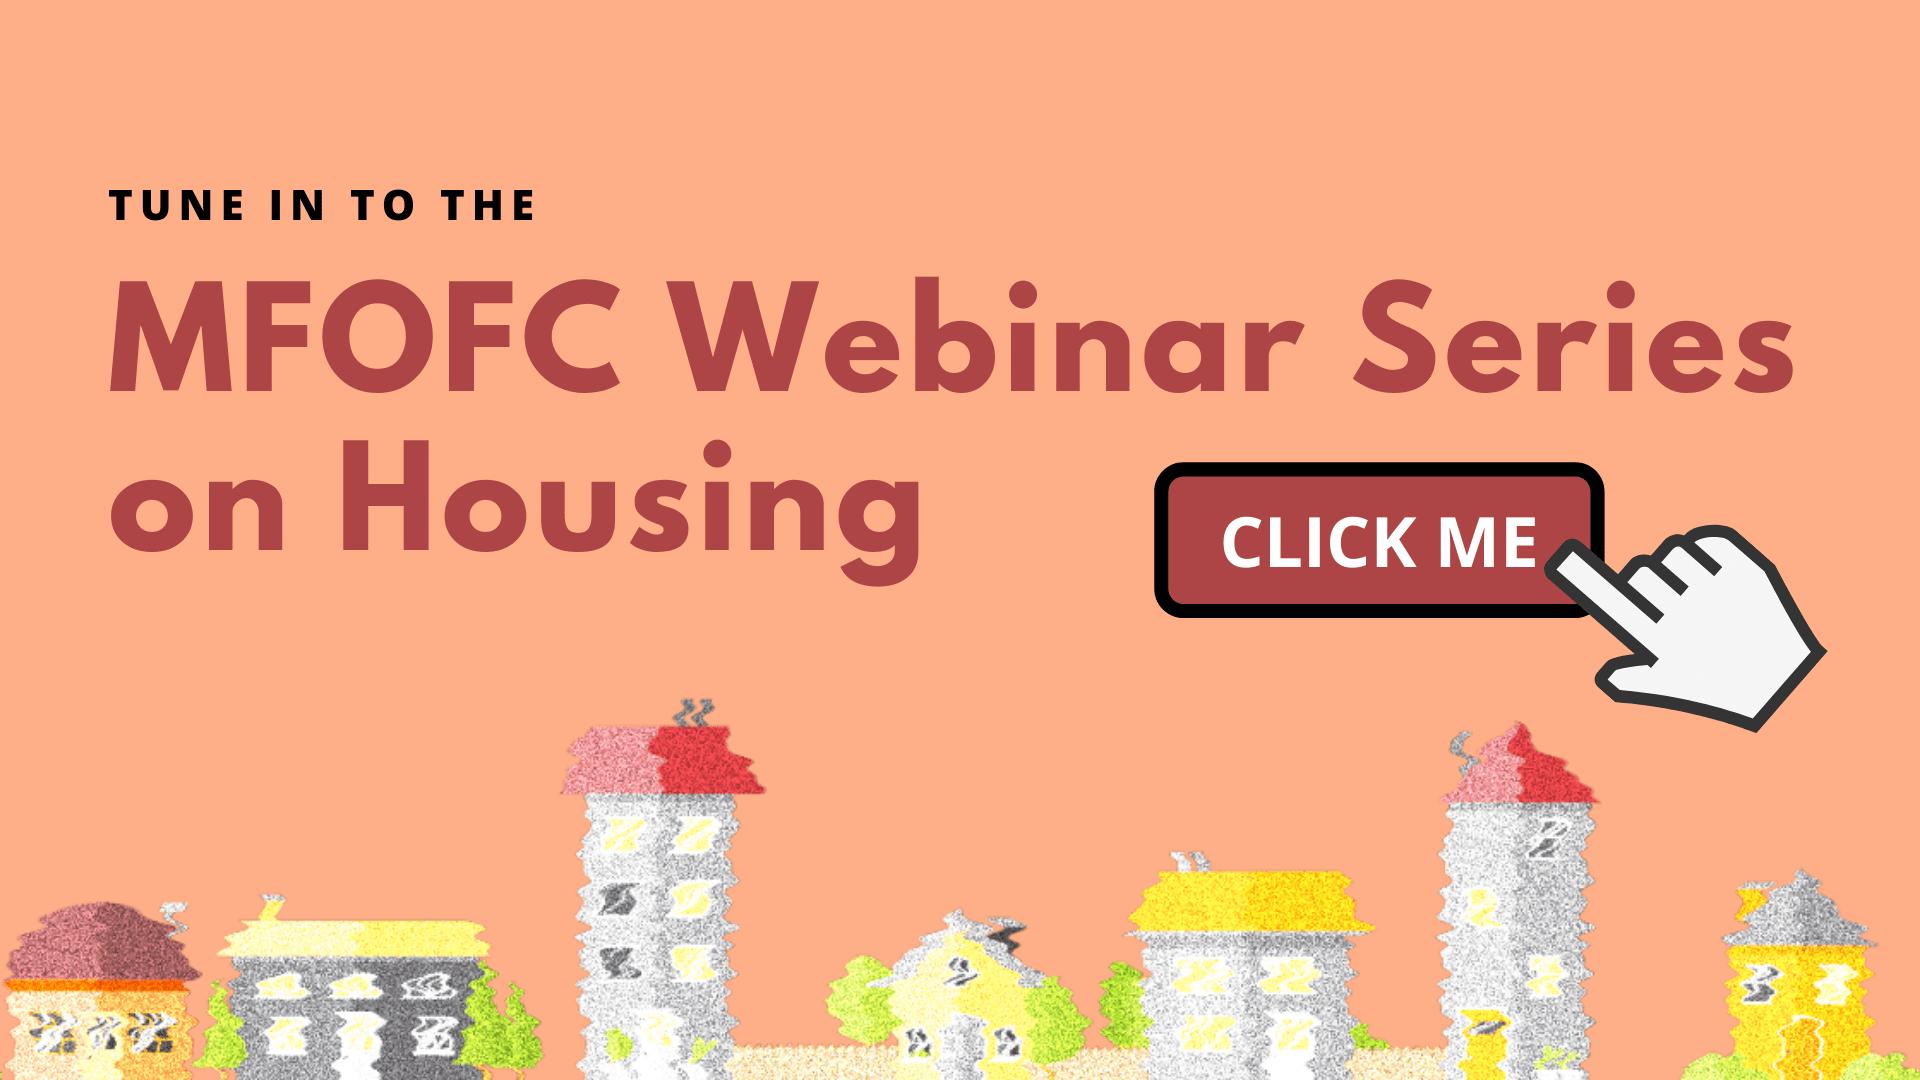 MFOFC Webinar Series on Housing